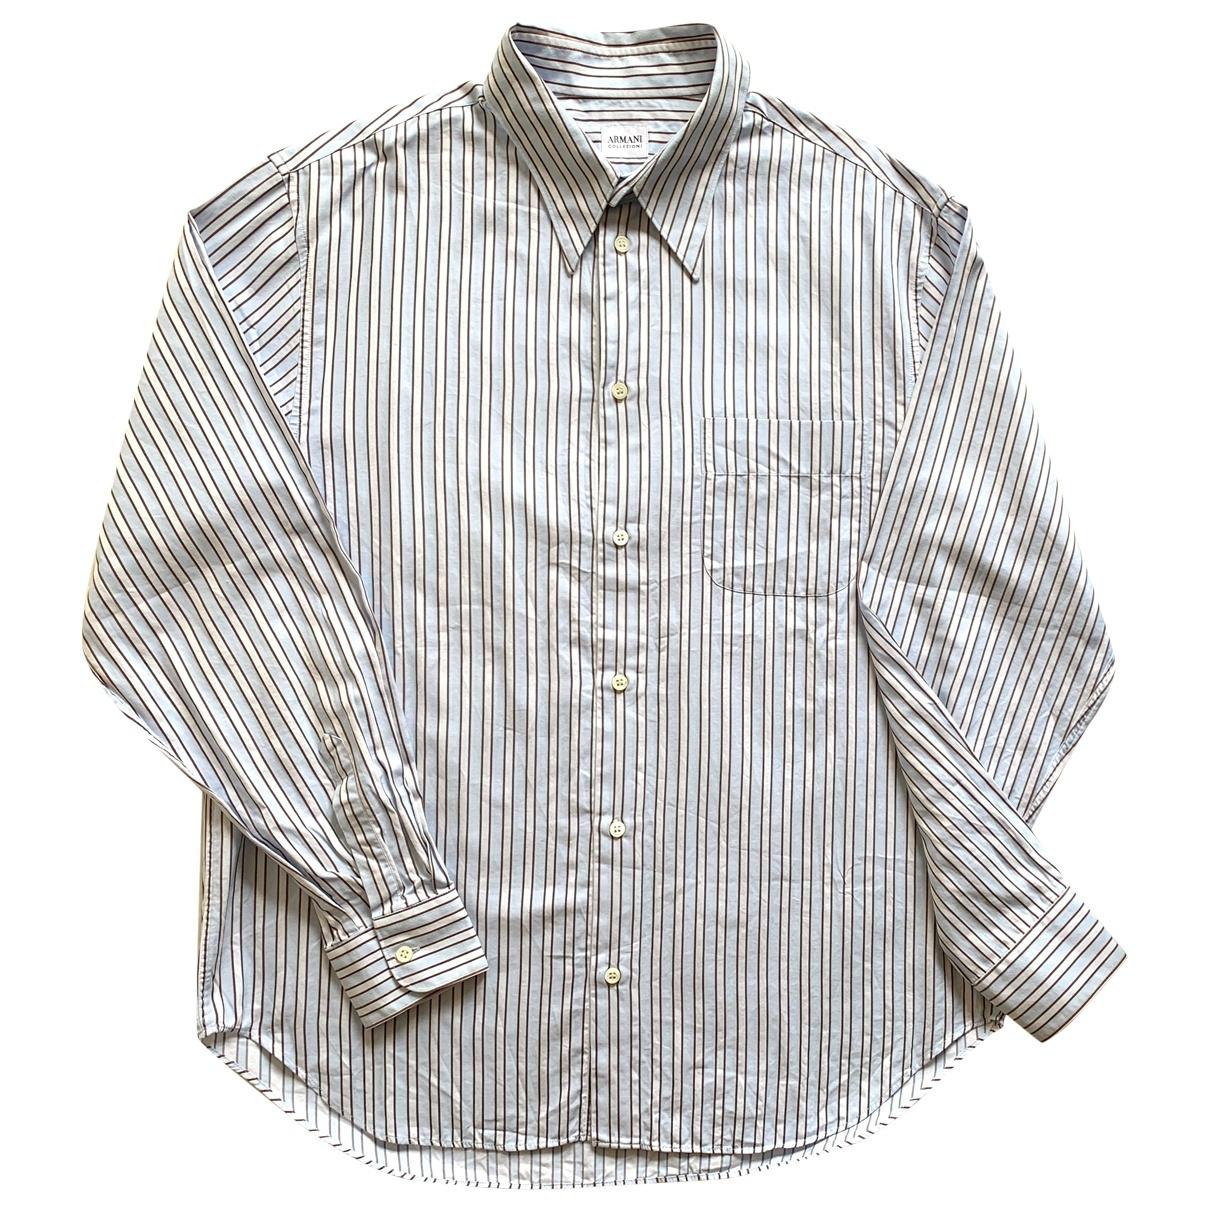 Armani Collezioni \N Multicolour Cotton Shirts for Men XL International